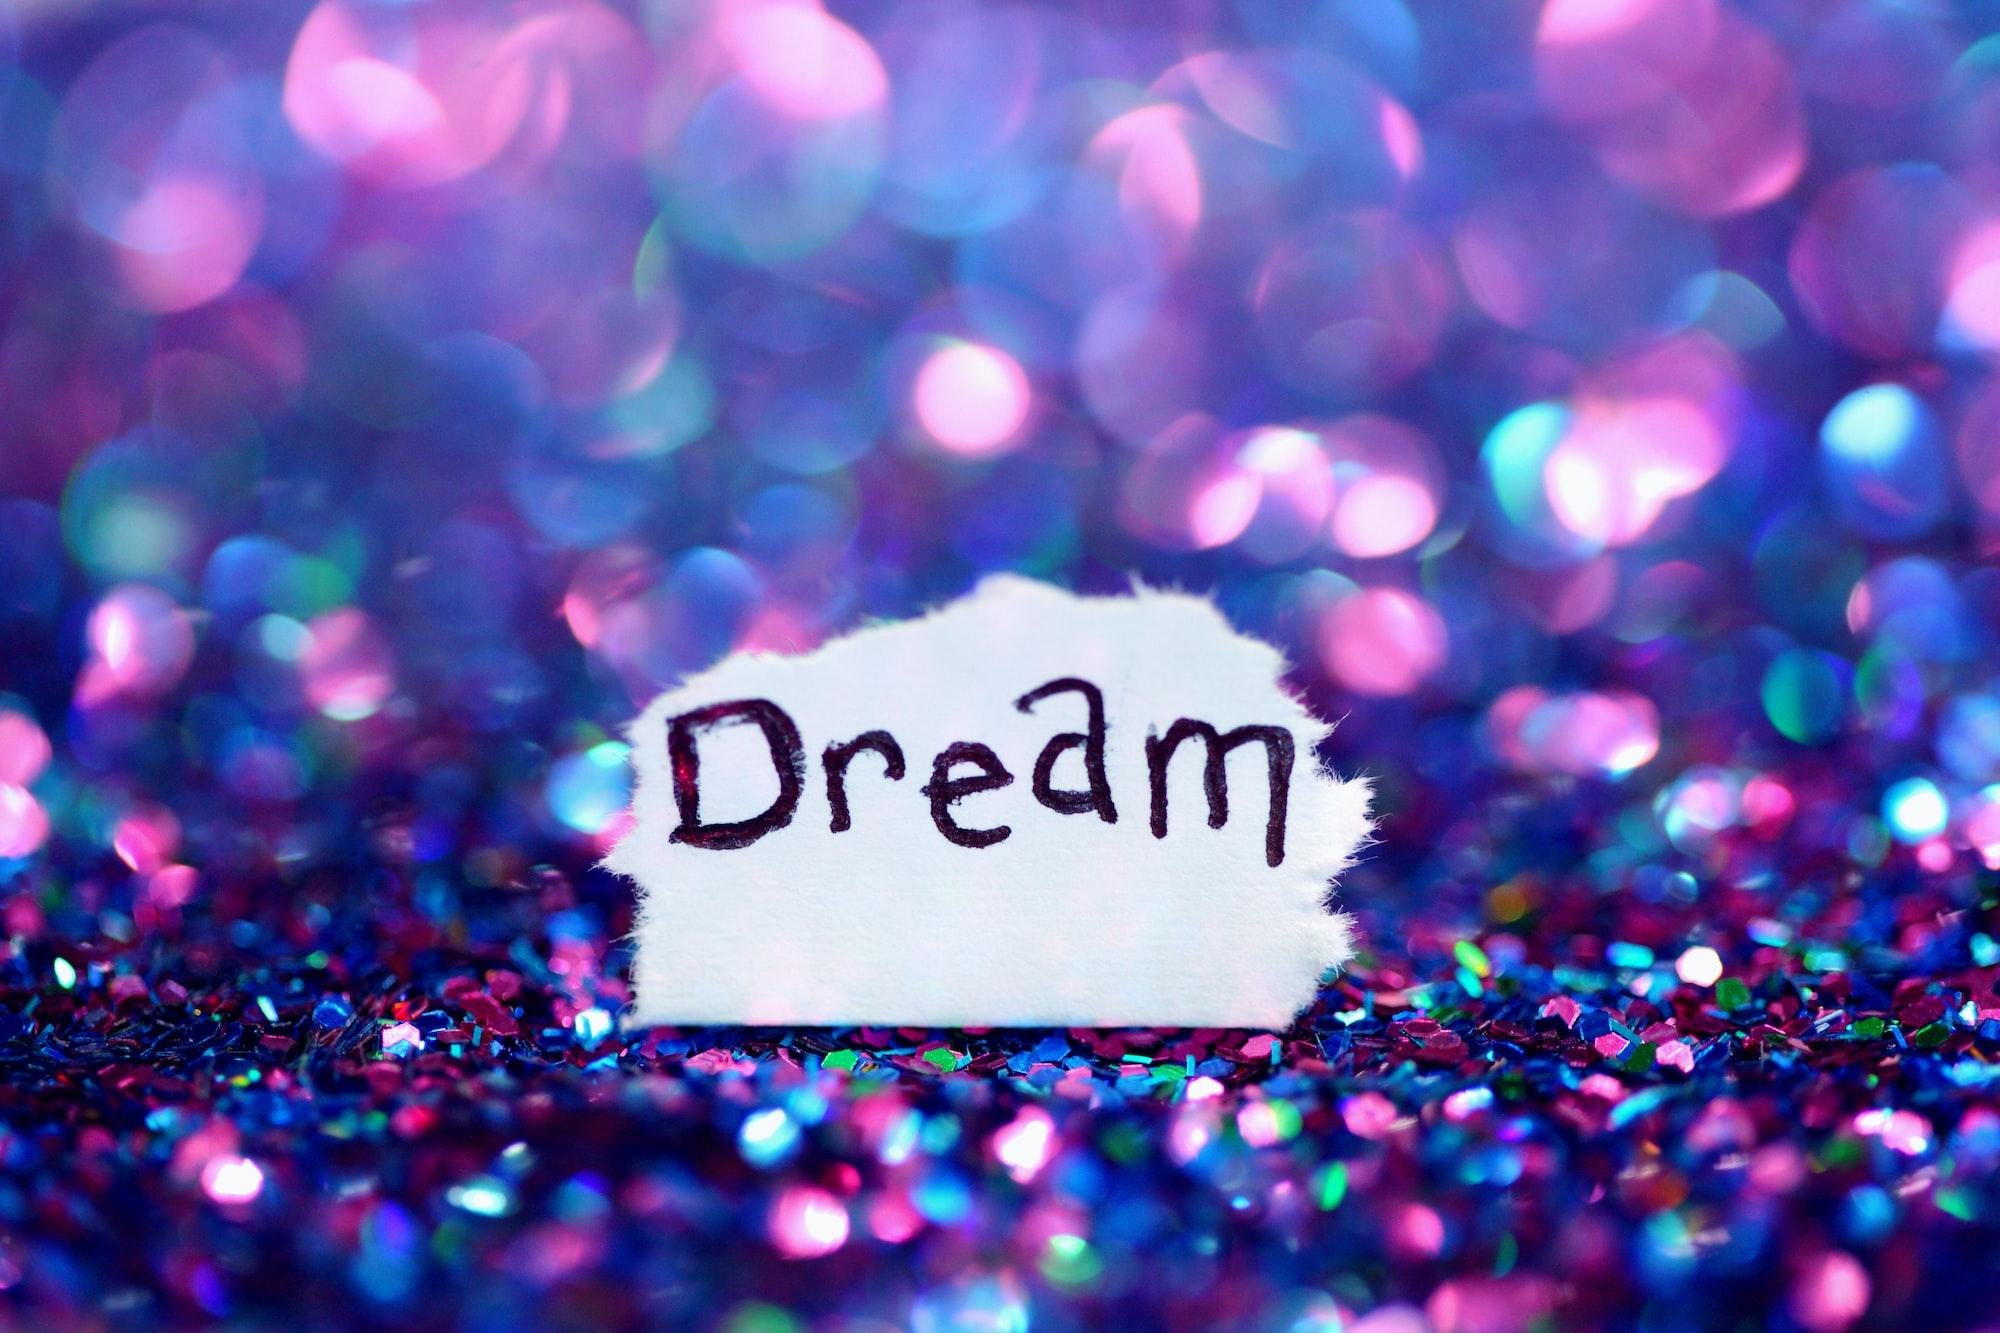 I have a dream..a software testing dream